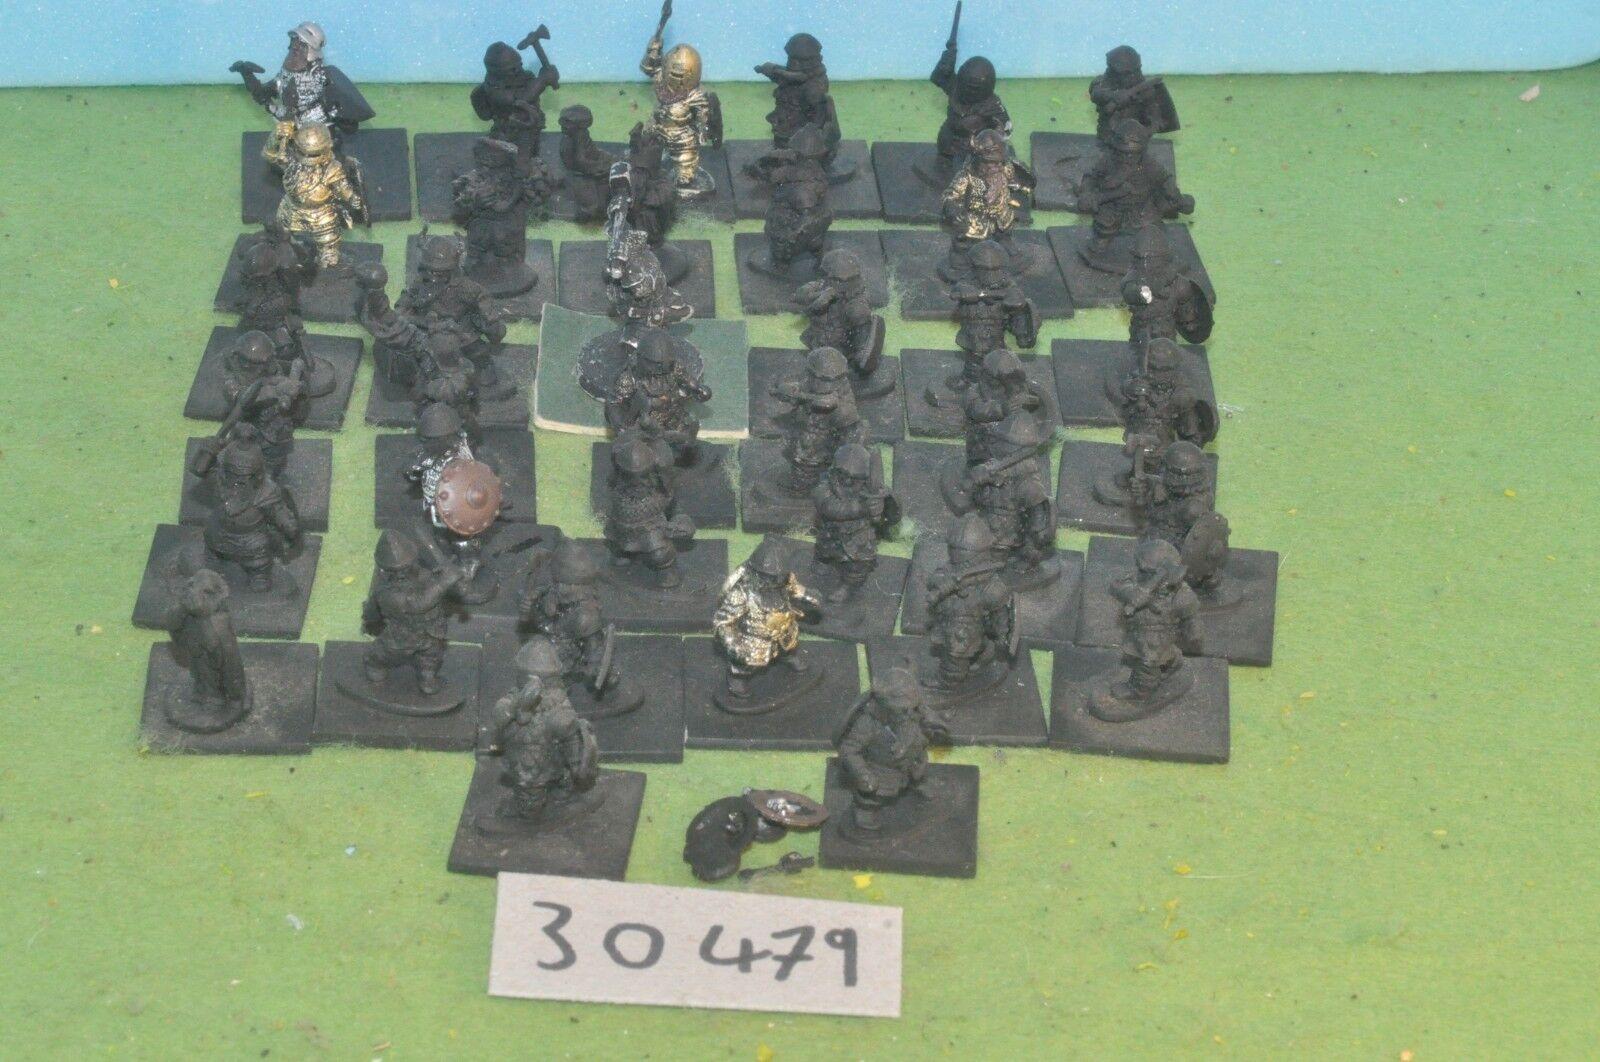 Warhammer fantasy sigmar order 38 dwarf warriors metal old edition oop (30479)